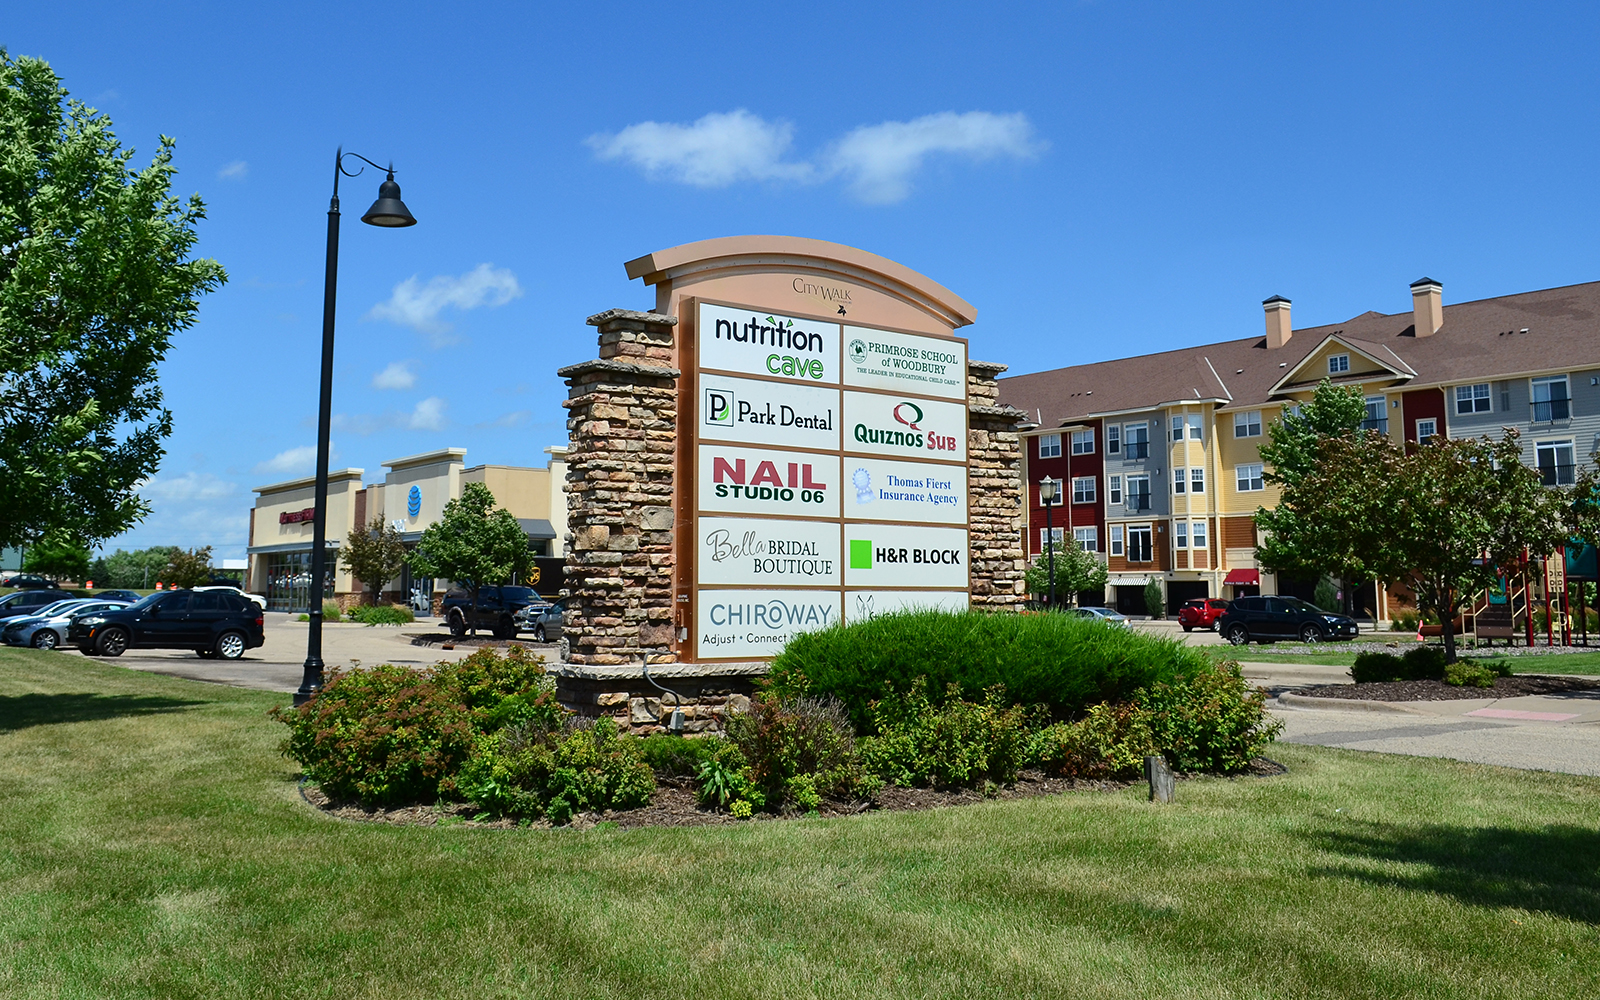 City Walk signage in Woodbury, MN